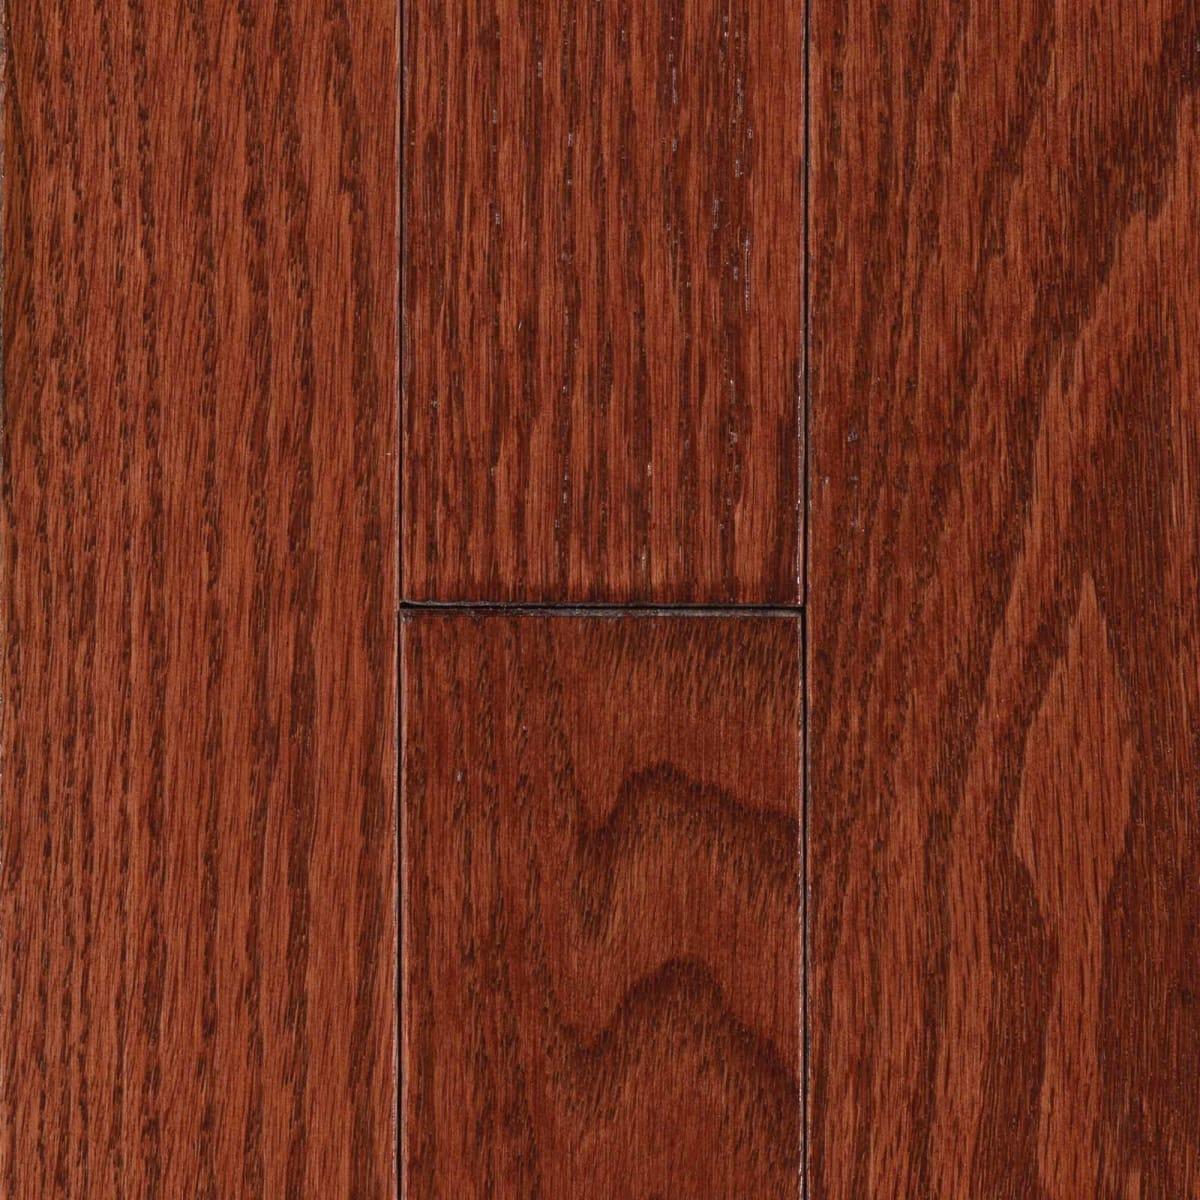 Mohawk Industries Bcs28 22 Oak Butterscotch Barletta 3 1 4 Wide Semi Gloss Solid Oak Hardwood Flooring Sold By Carton 17 6 Sf Carton